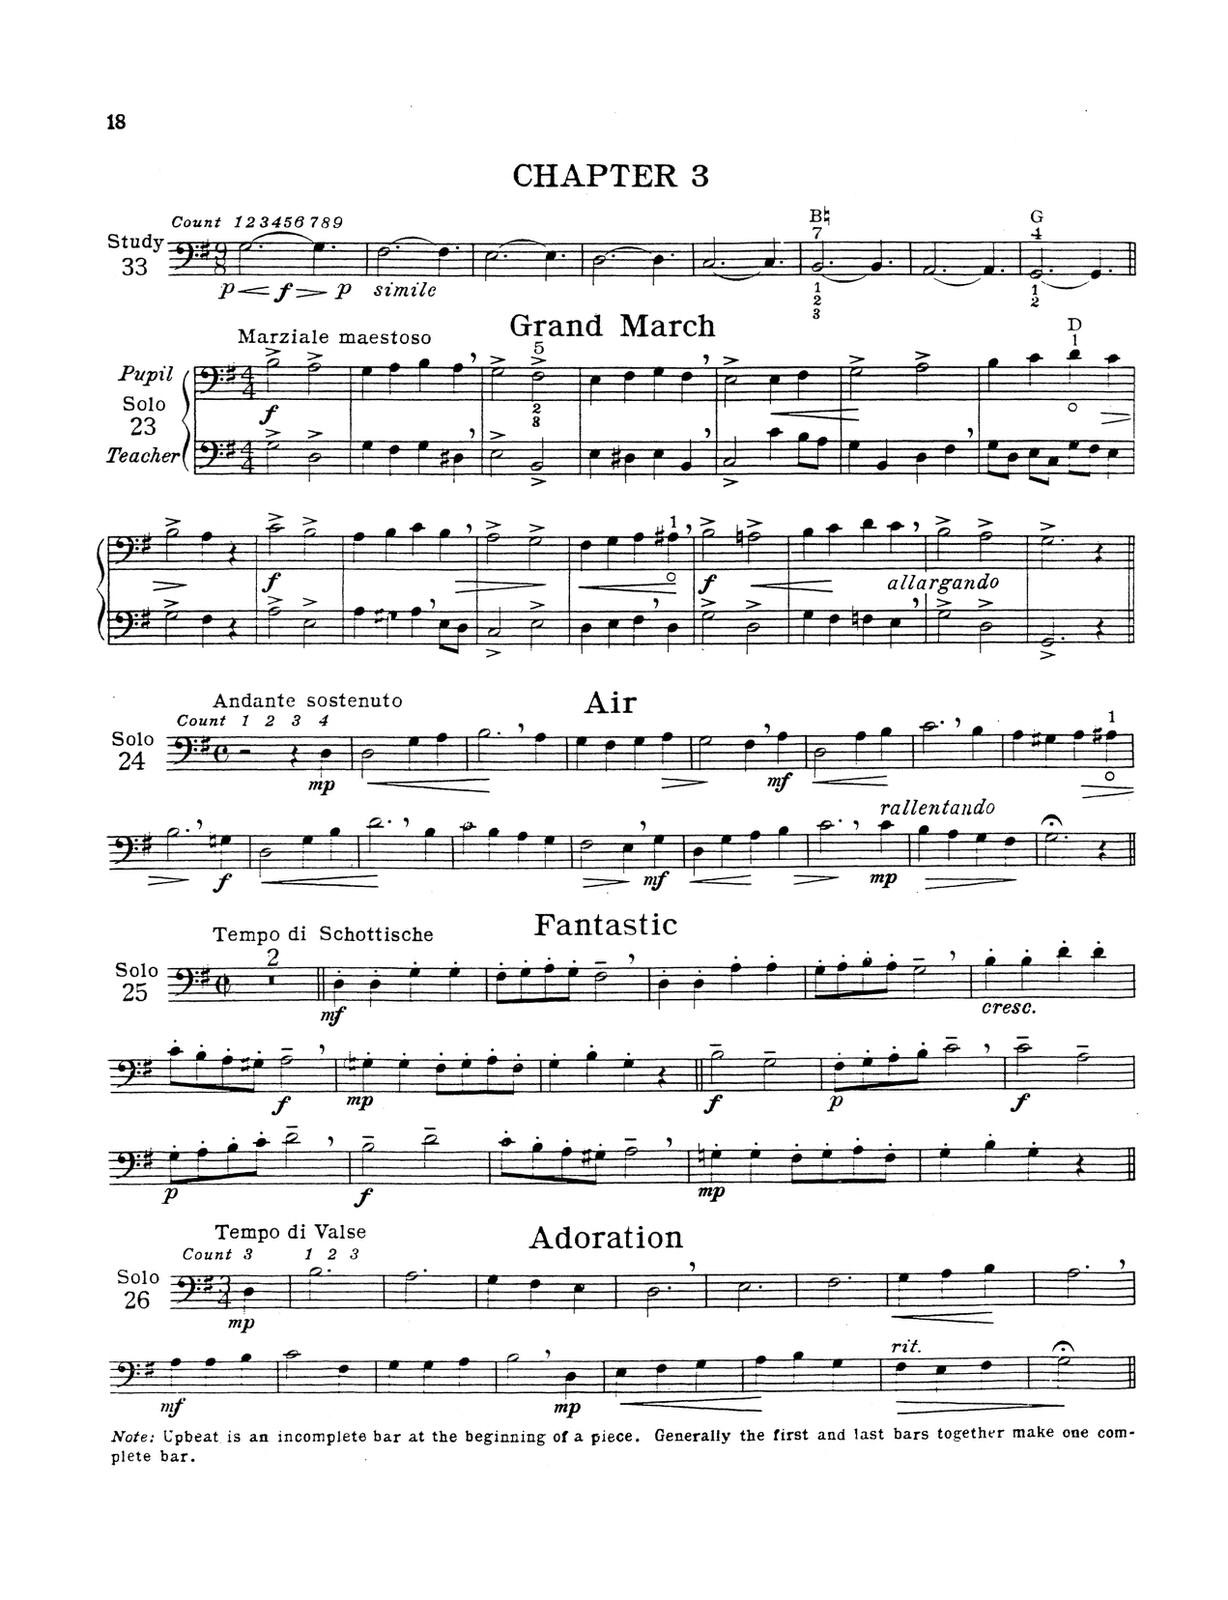 Williams, Method for Trombone 5